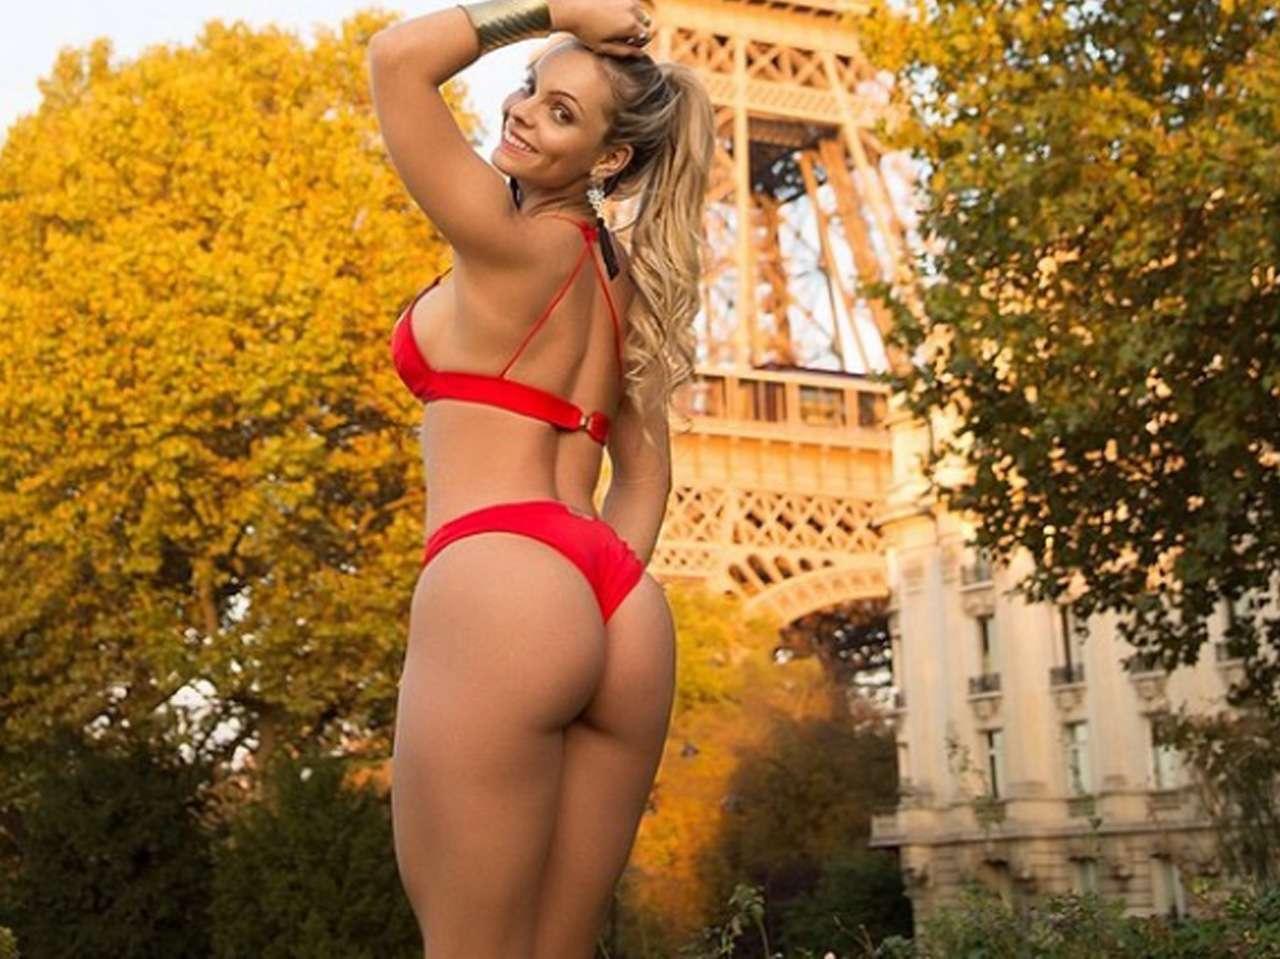 Indianara Carvalho, participante de Miss Bum Bum Foto: Instagram / Indianara